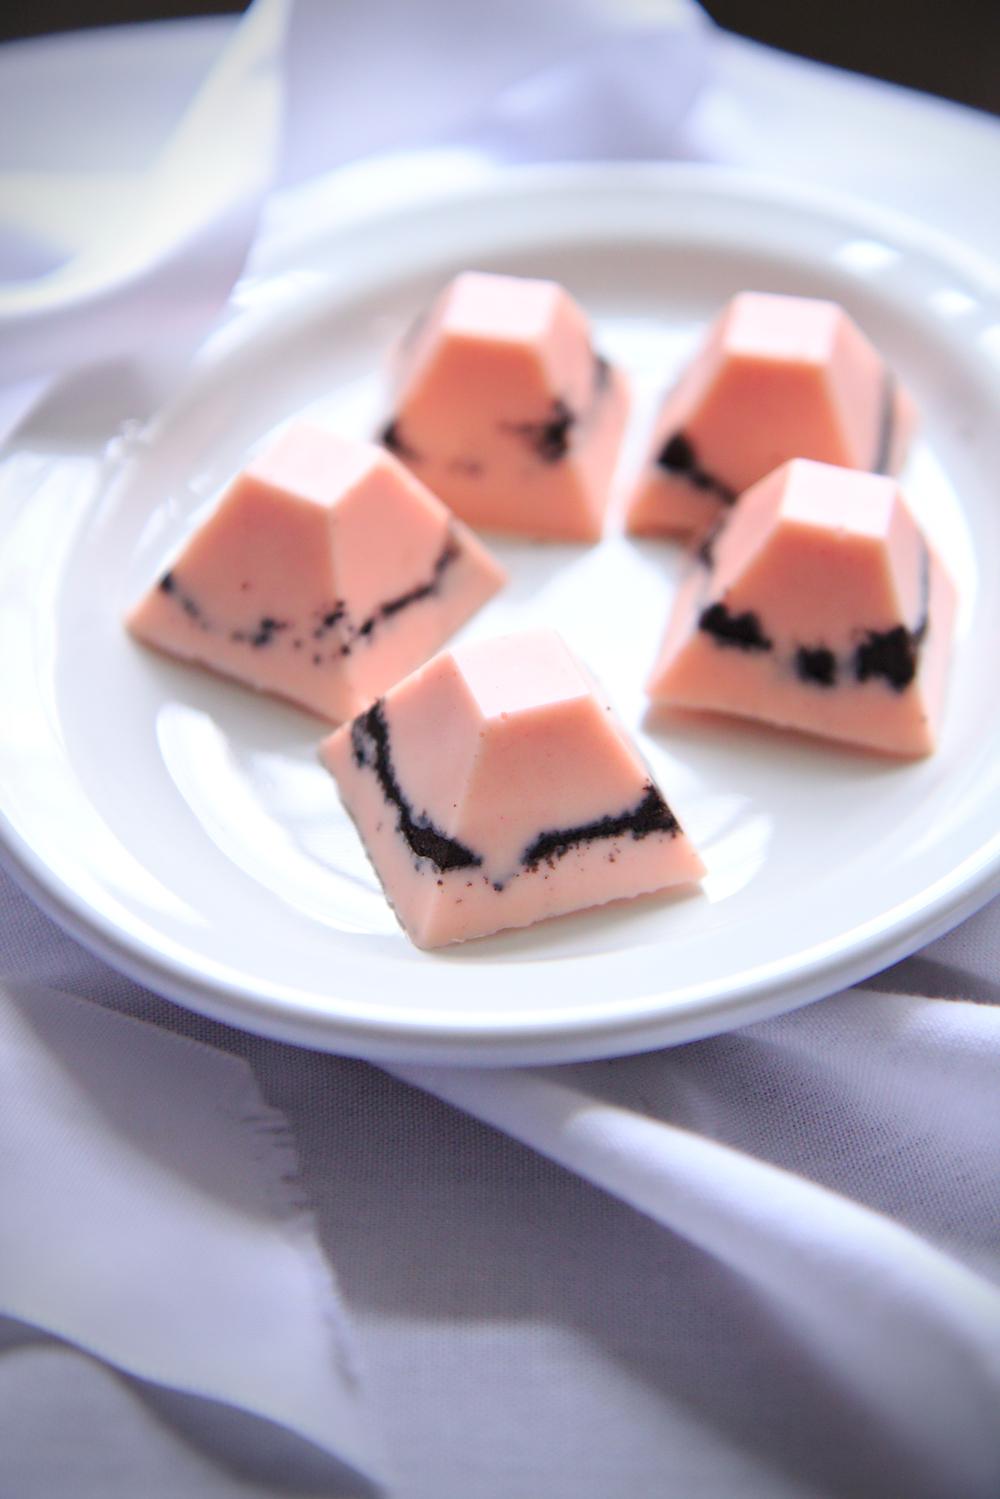 Nectar & Stone inspired chocolates | La Pêche Fraîche